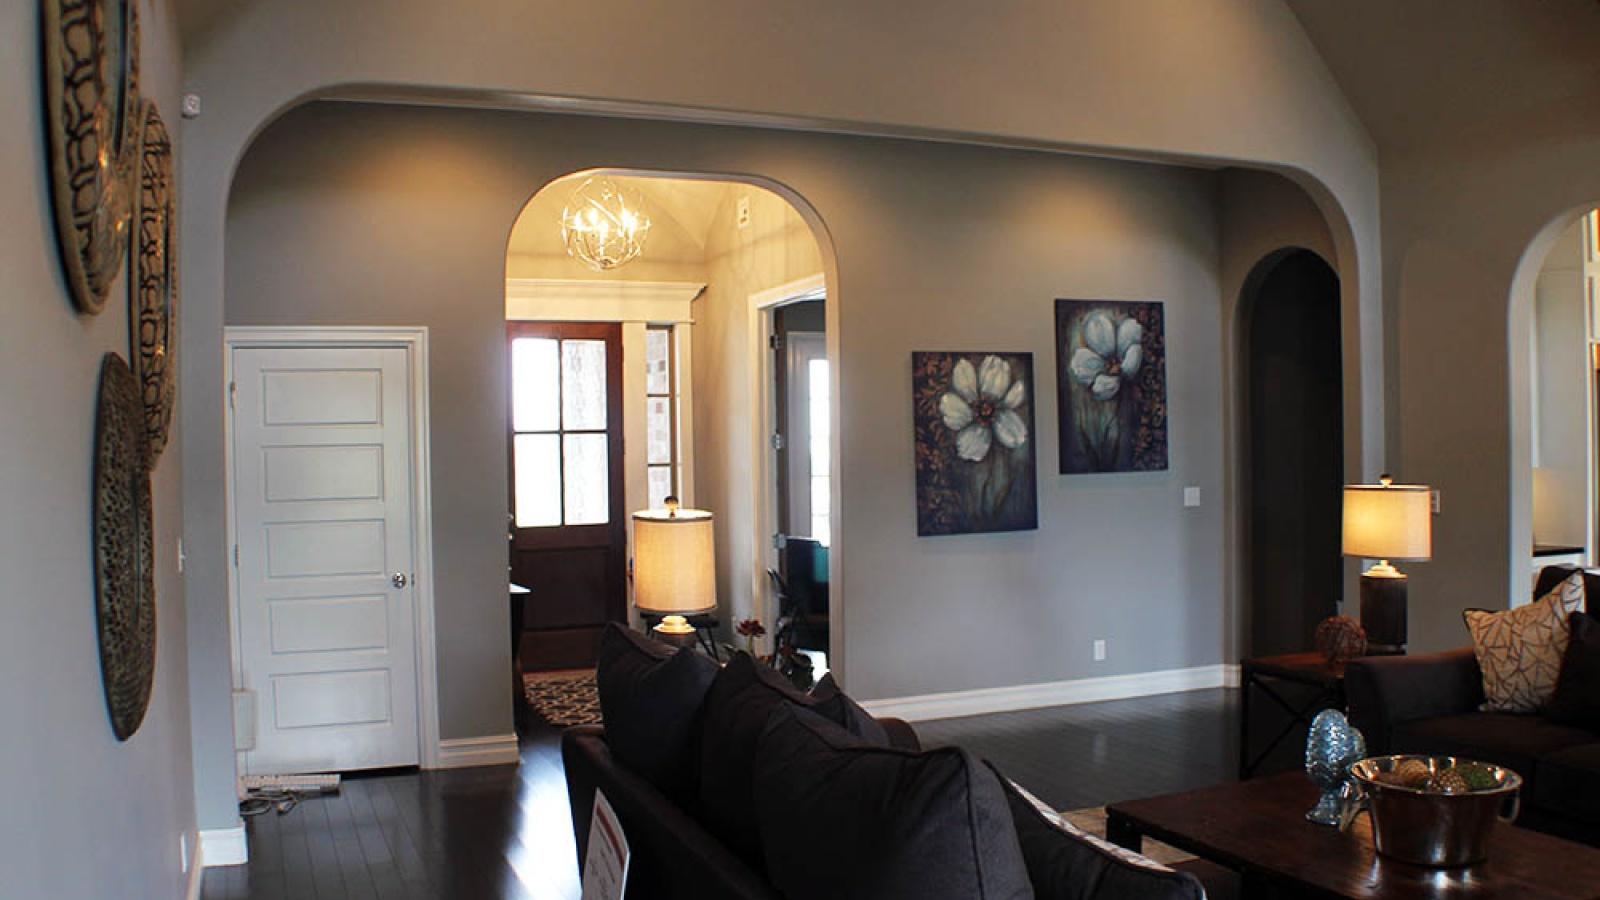 4 Bedrooms Bedrooms, ,4 BathroomsBathrooms,Custom Home,Home Plans,1038